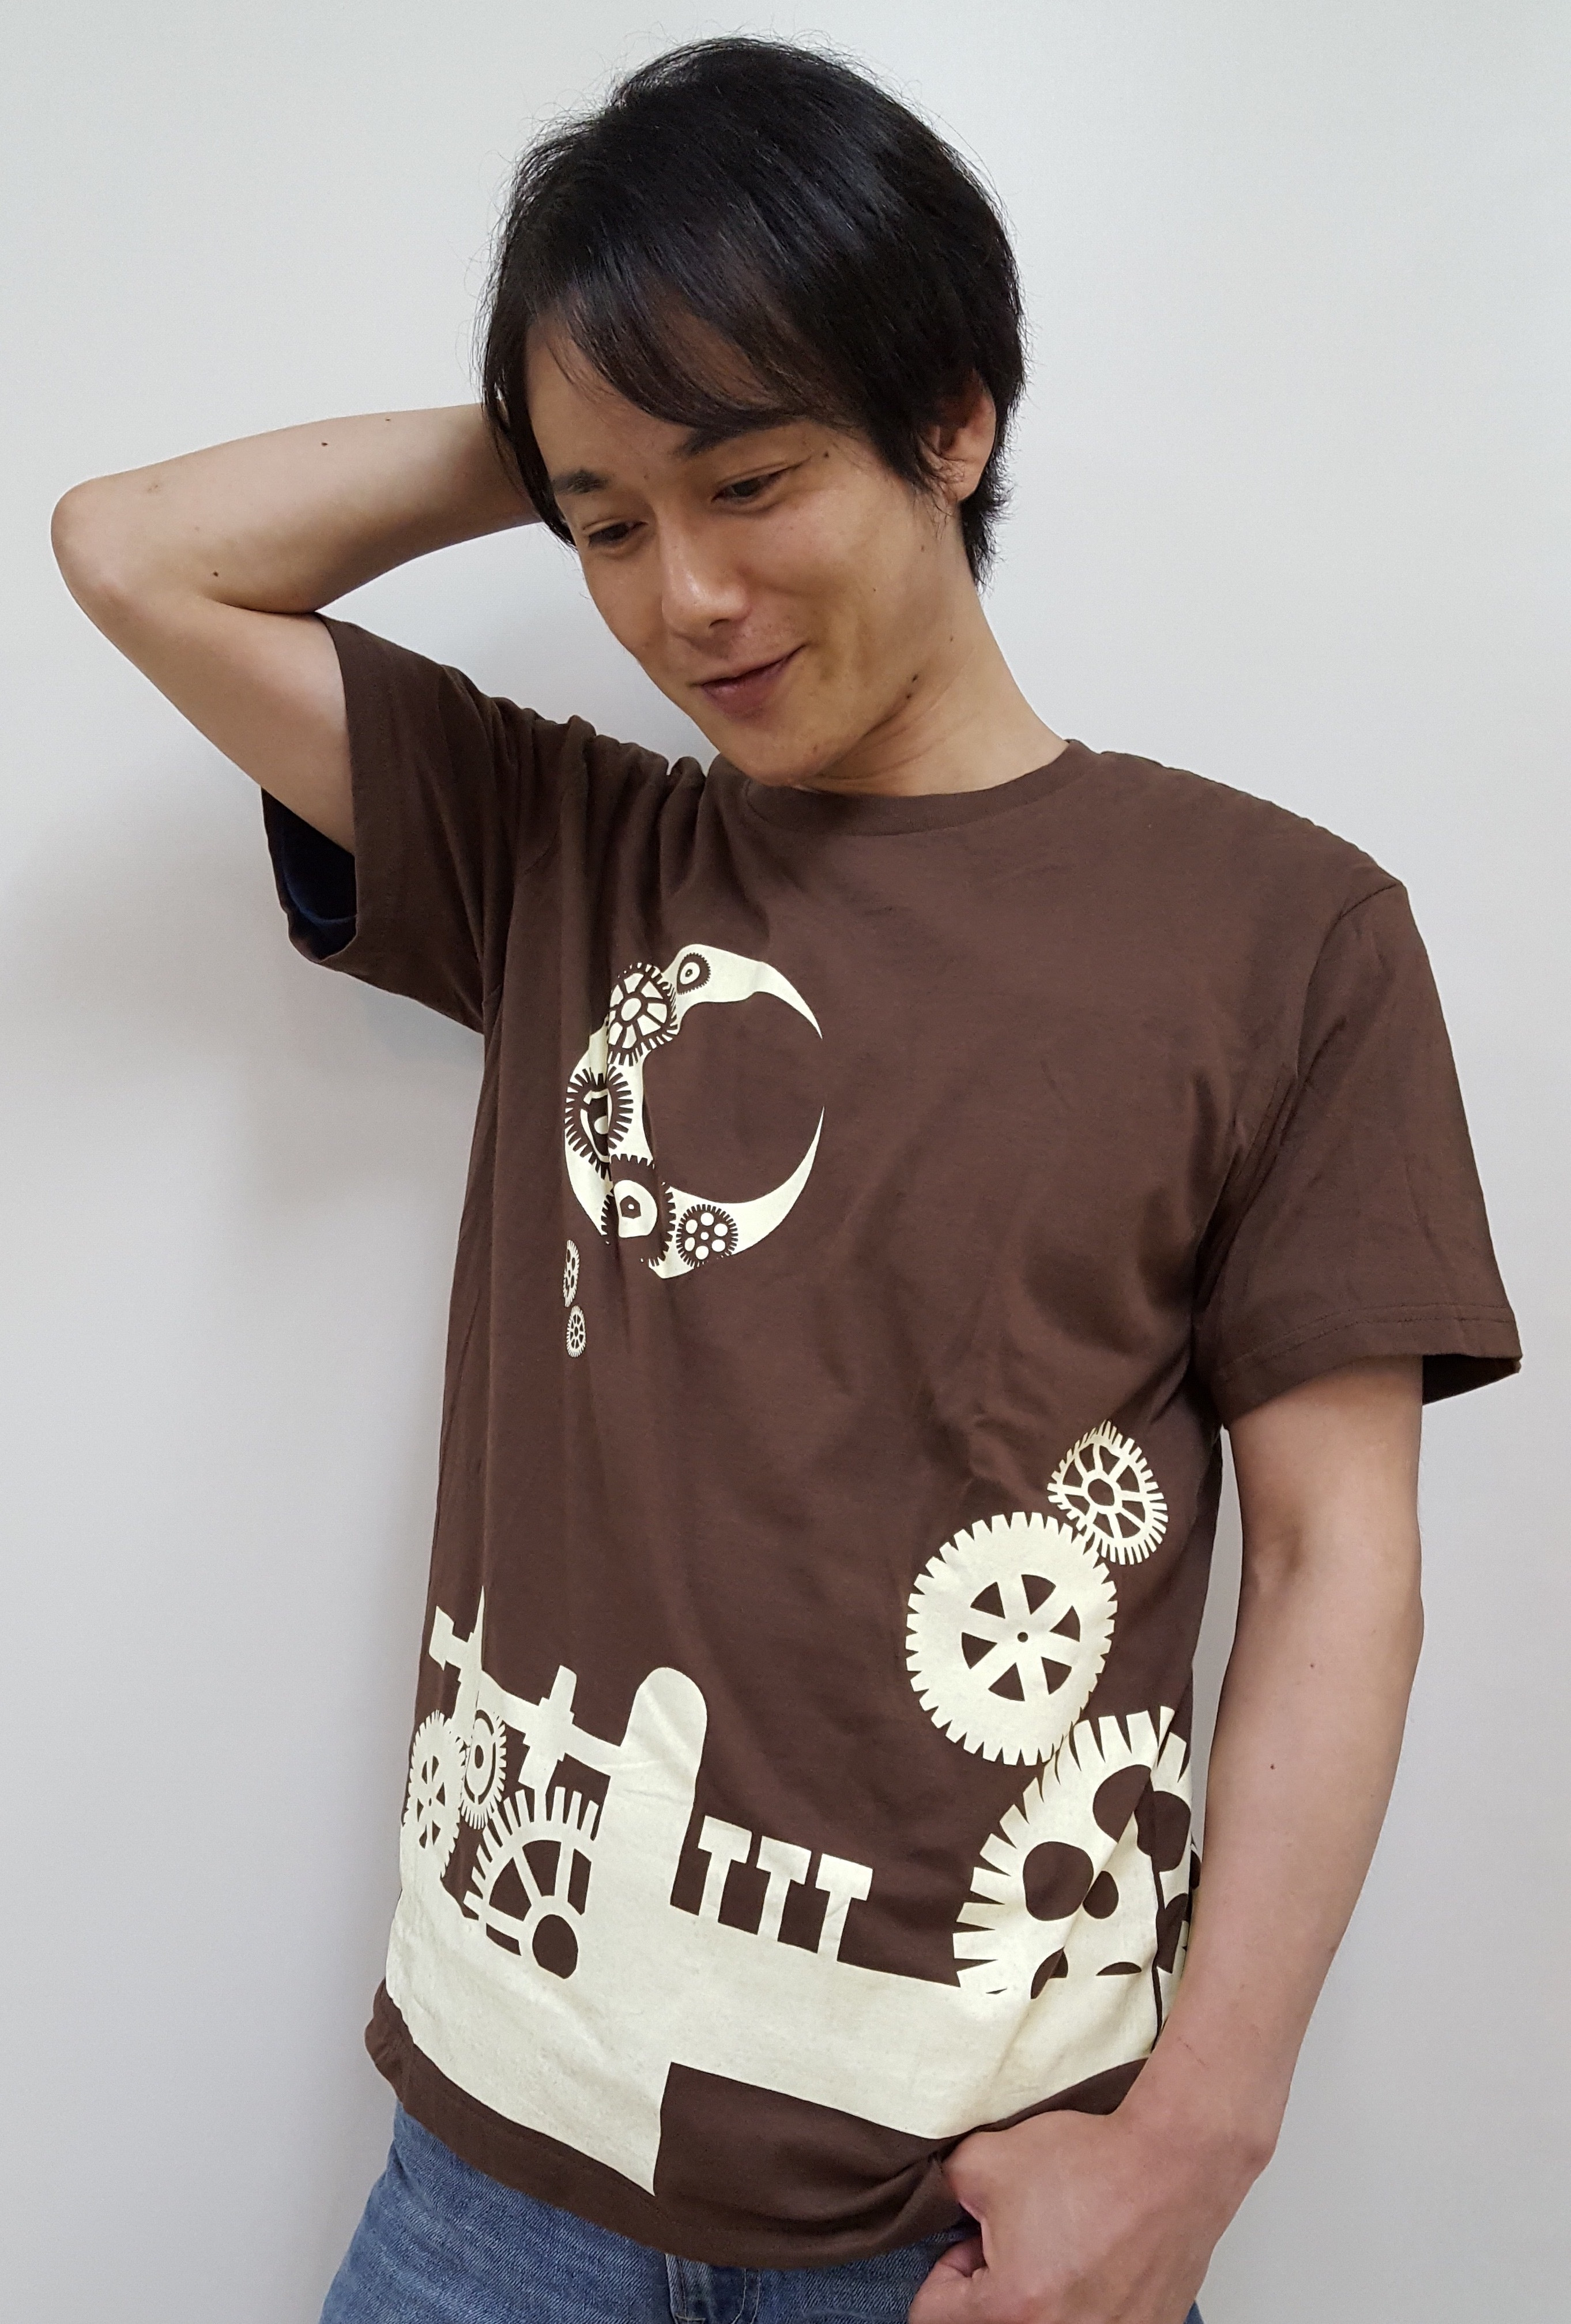 Tシャツ 「シアターグリーン3劇場連動企画」ブラウン